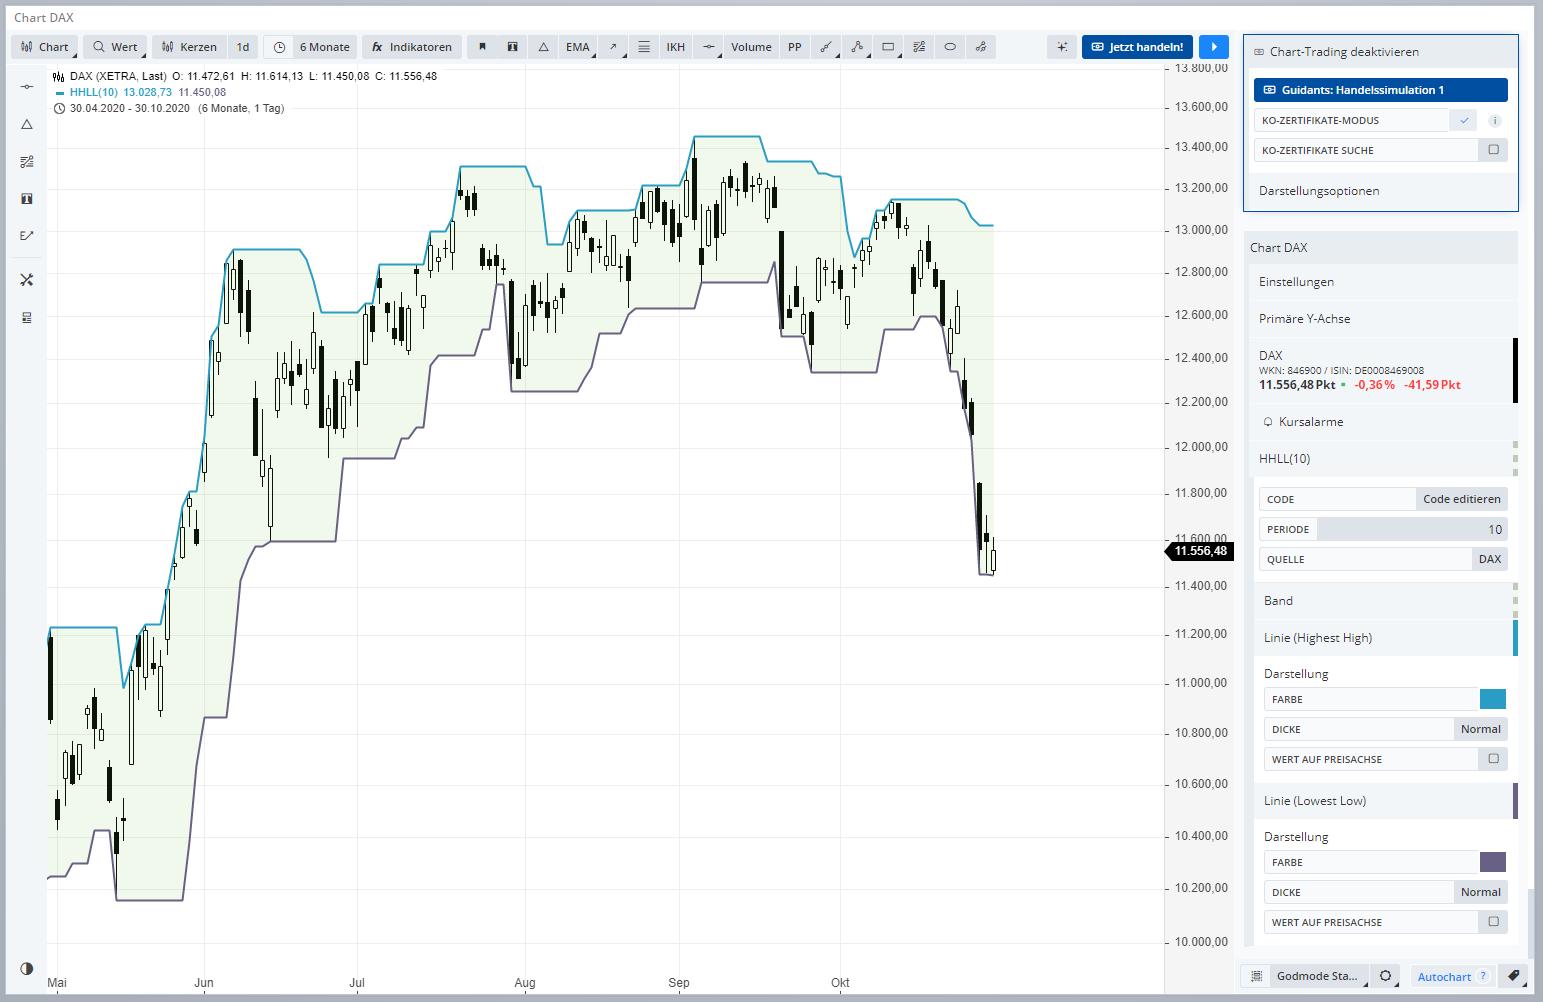 Indikatoren-Knowhow-Donchian-Channel-Highest-High-Lowest-Low-Rene-Berteit-GodmodeTrader.de-1